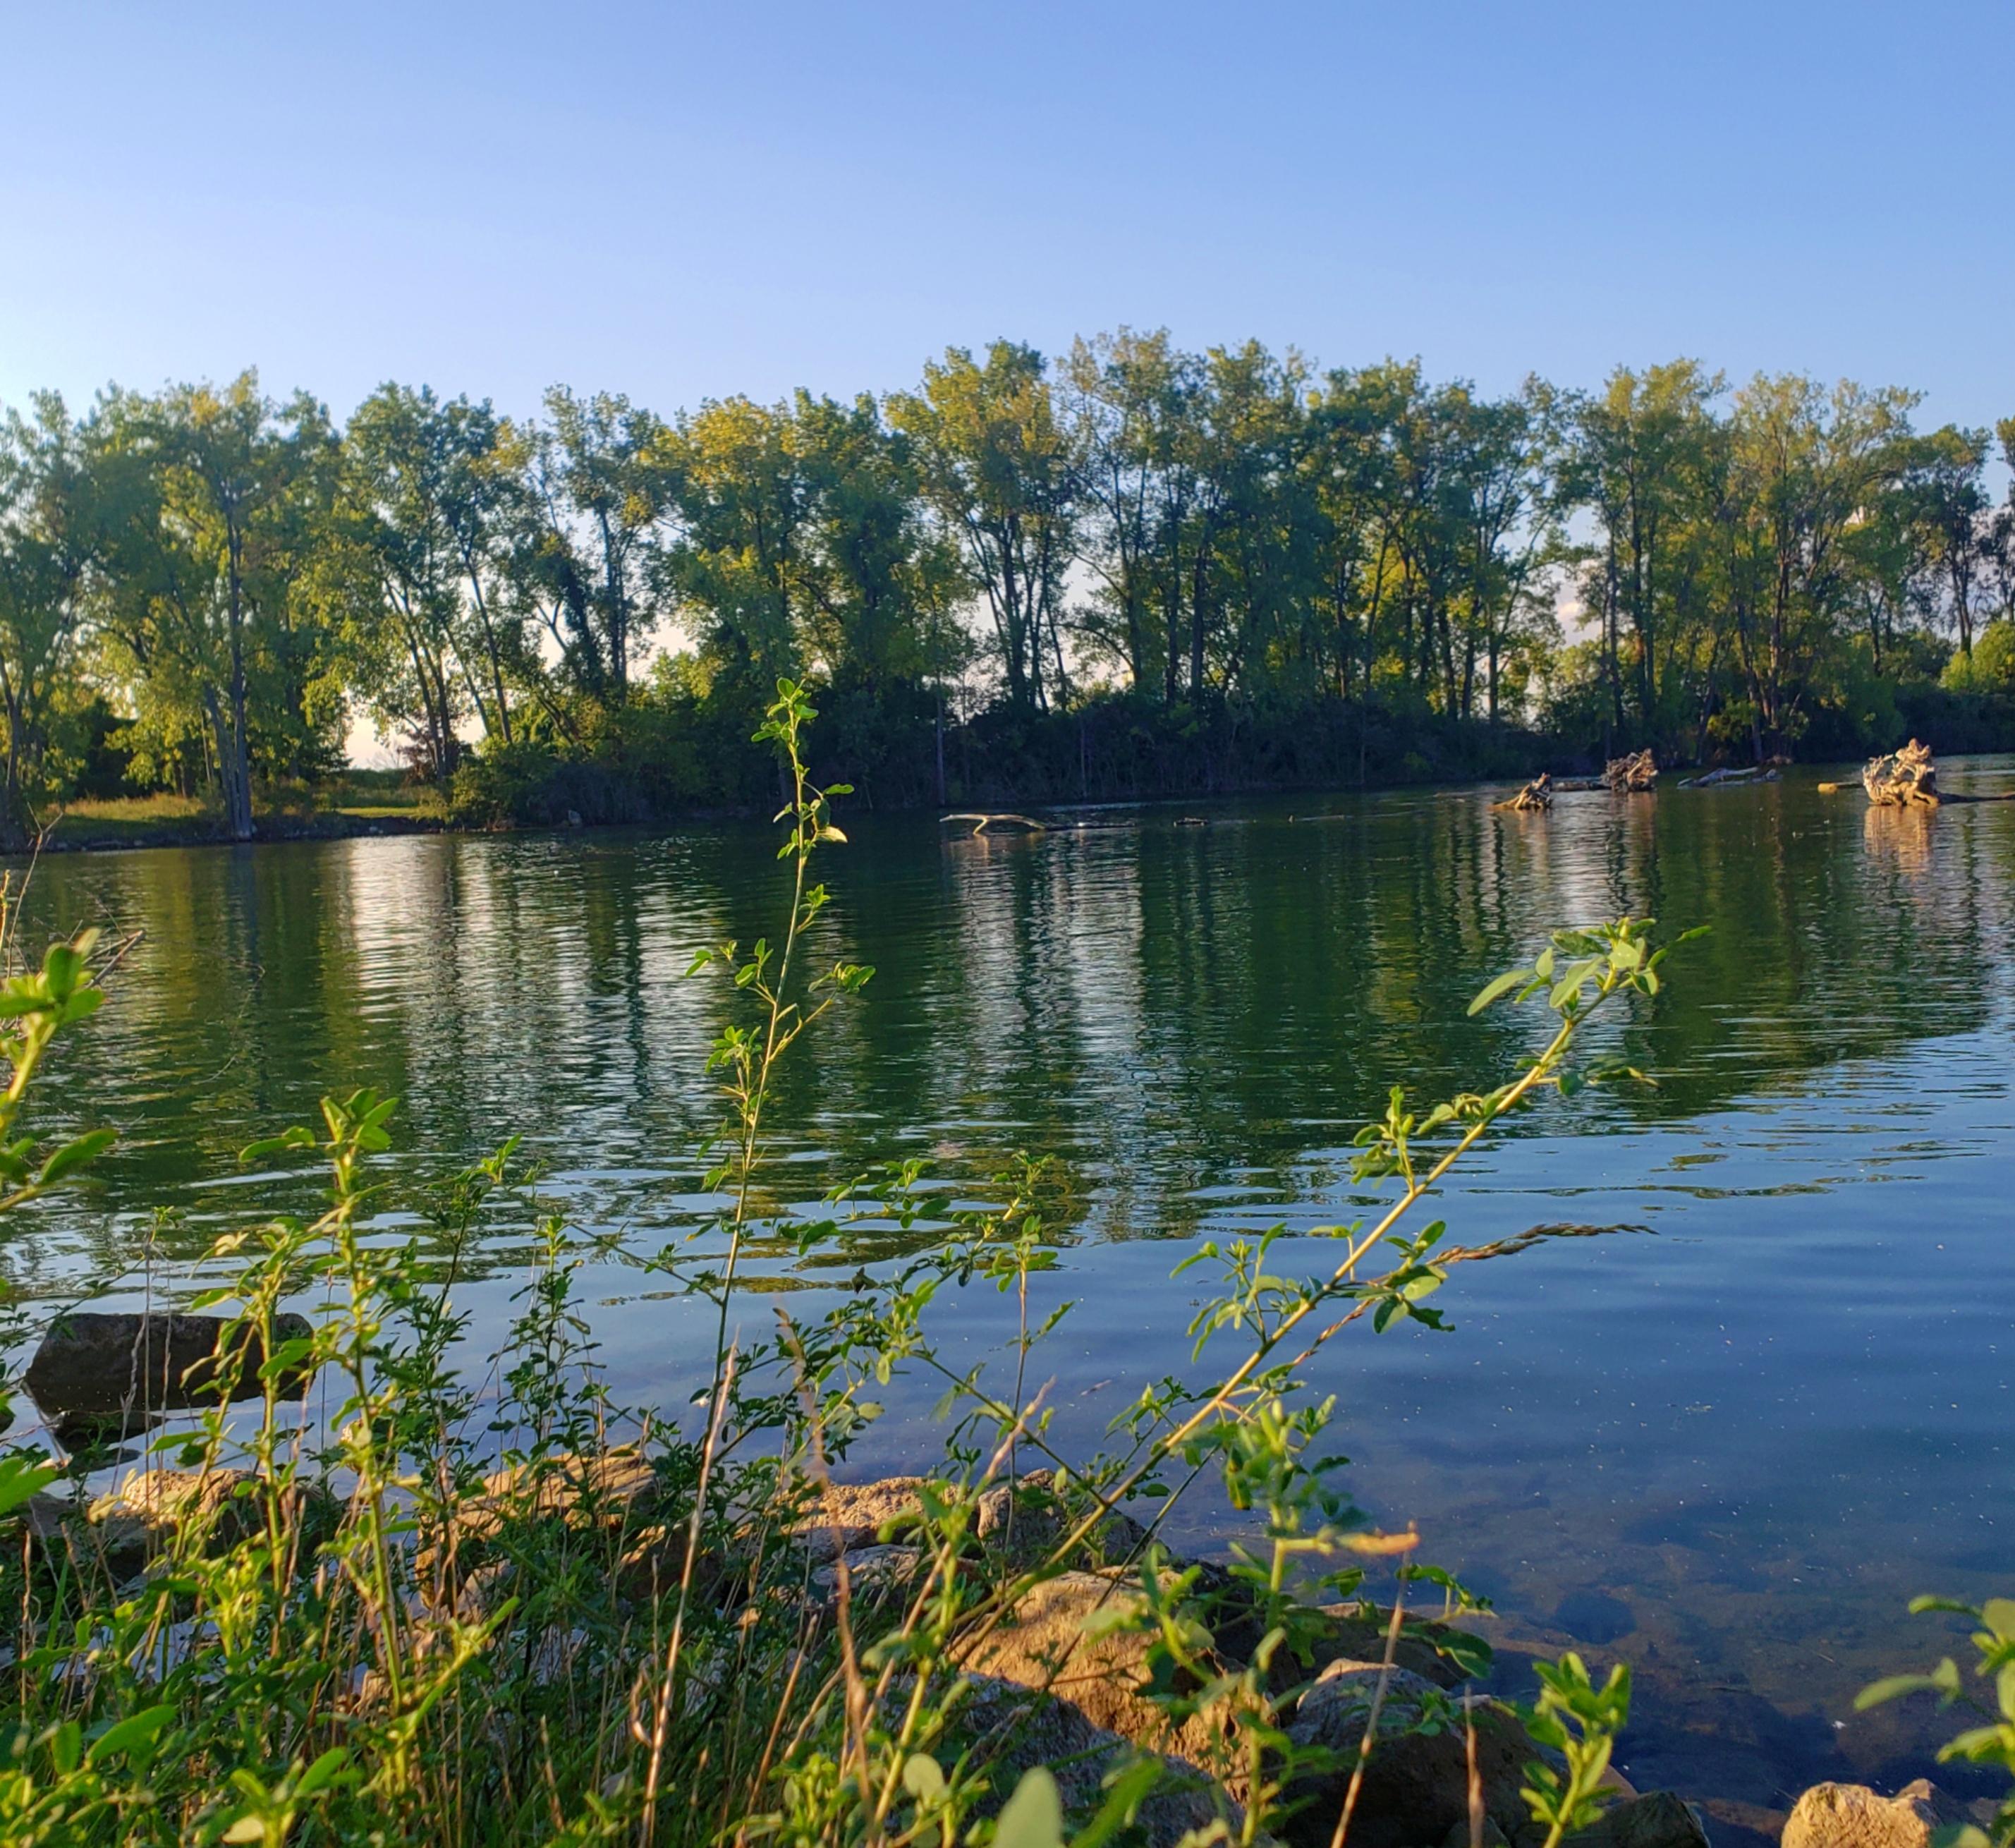 The Blue Heron Lagoon on Belle Isle State Park